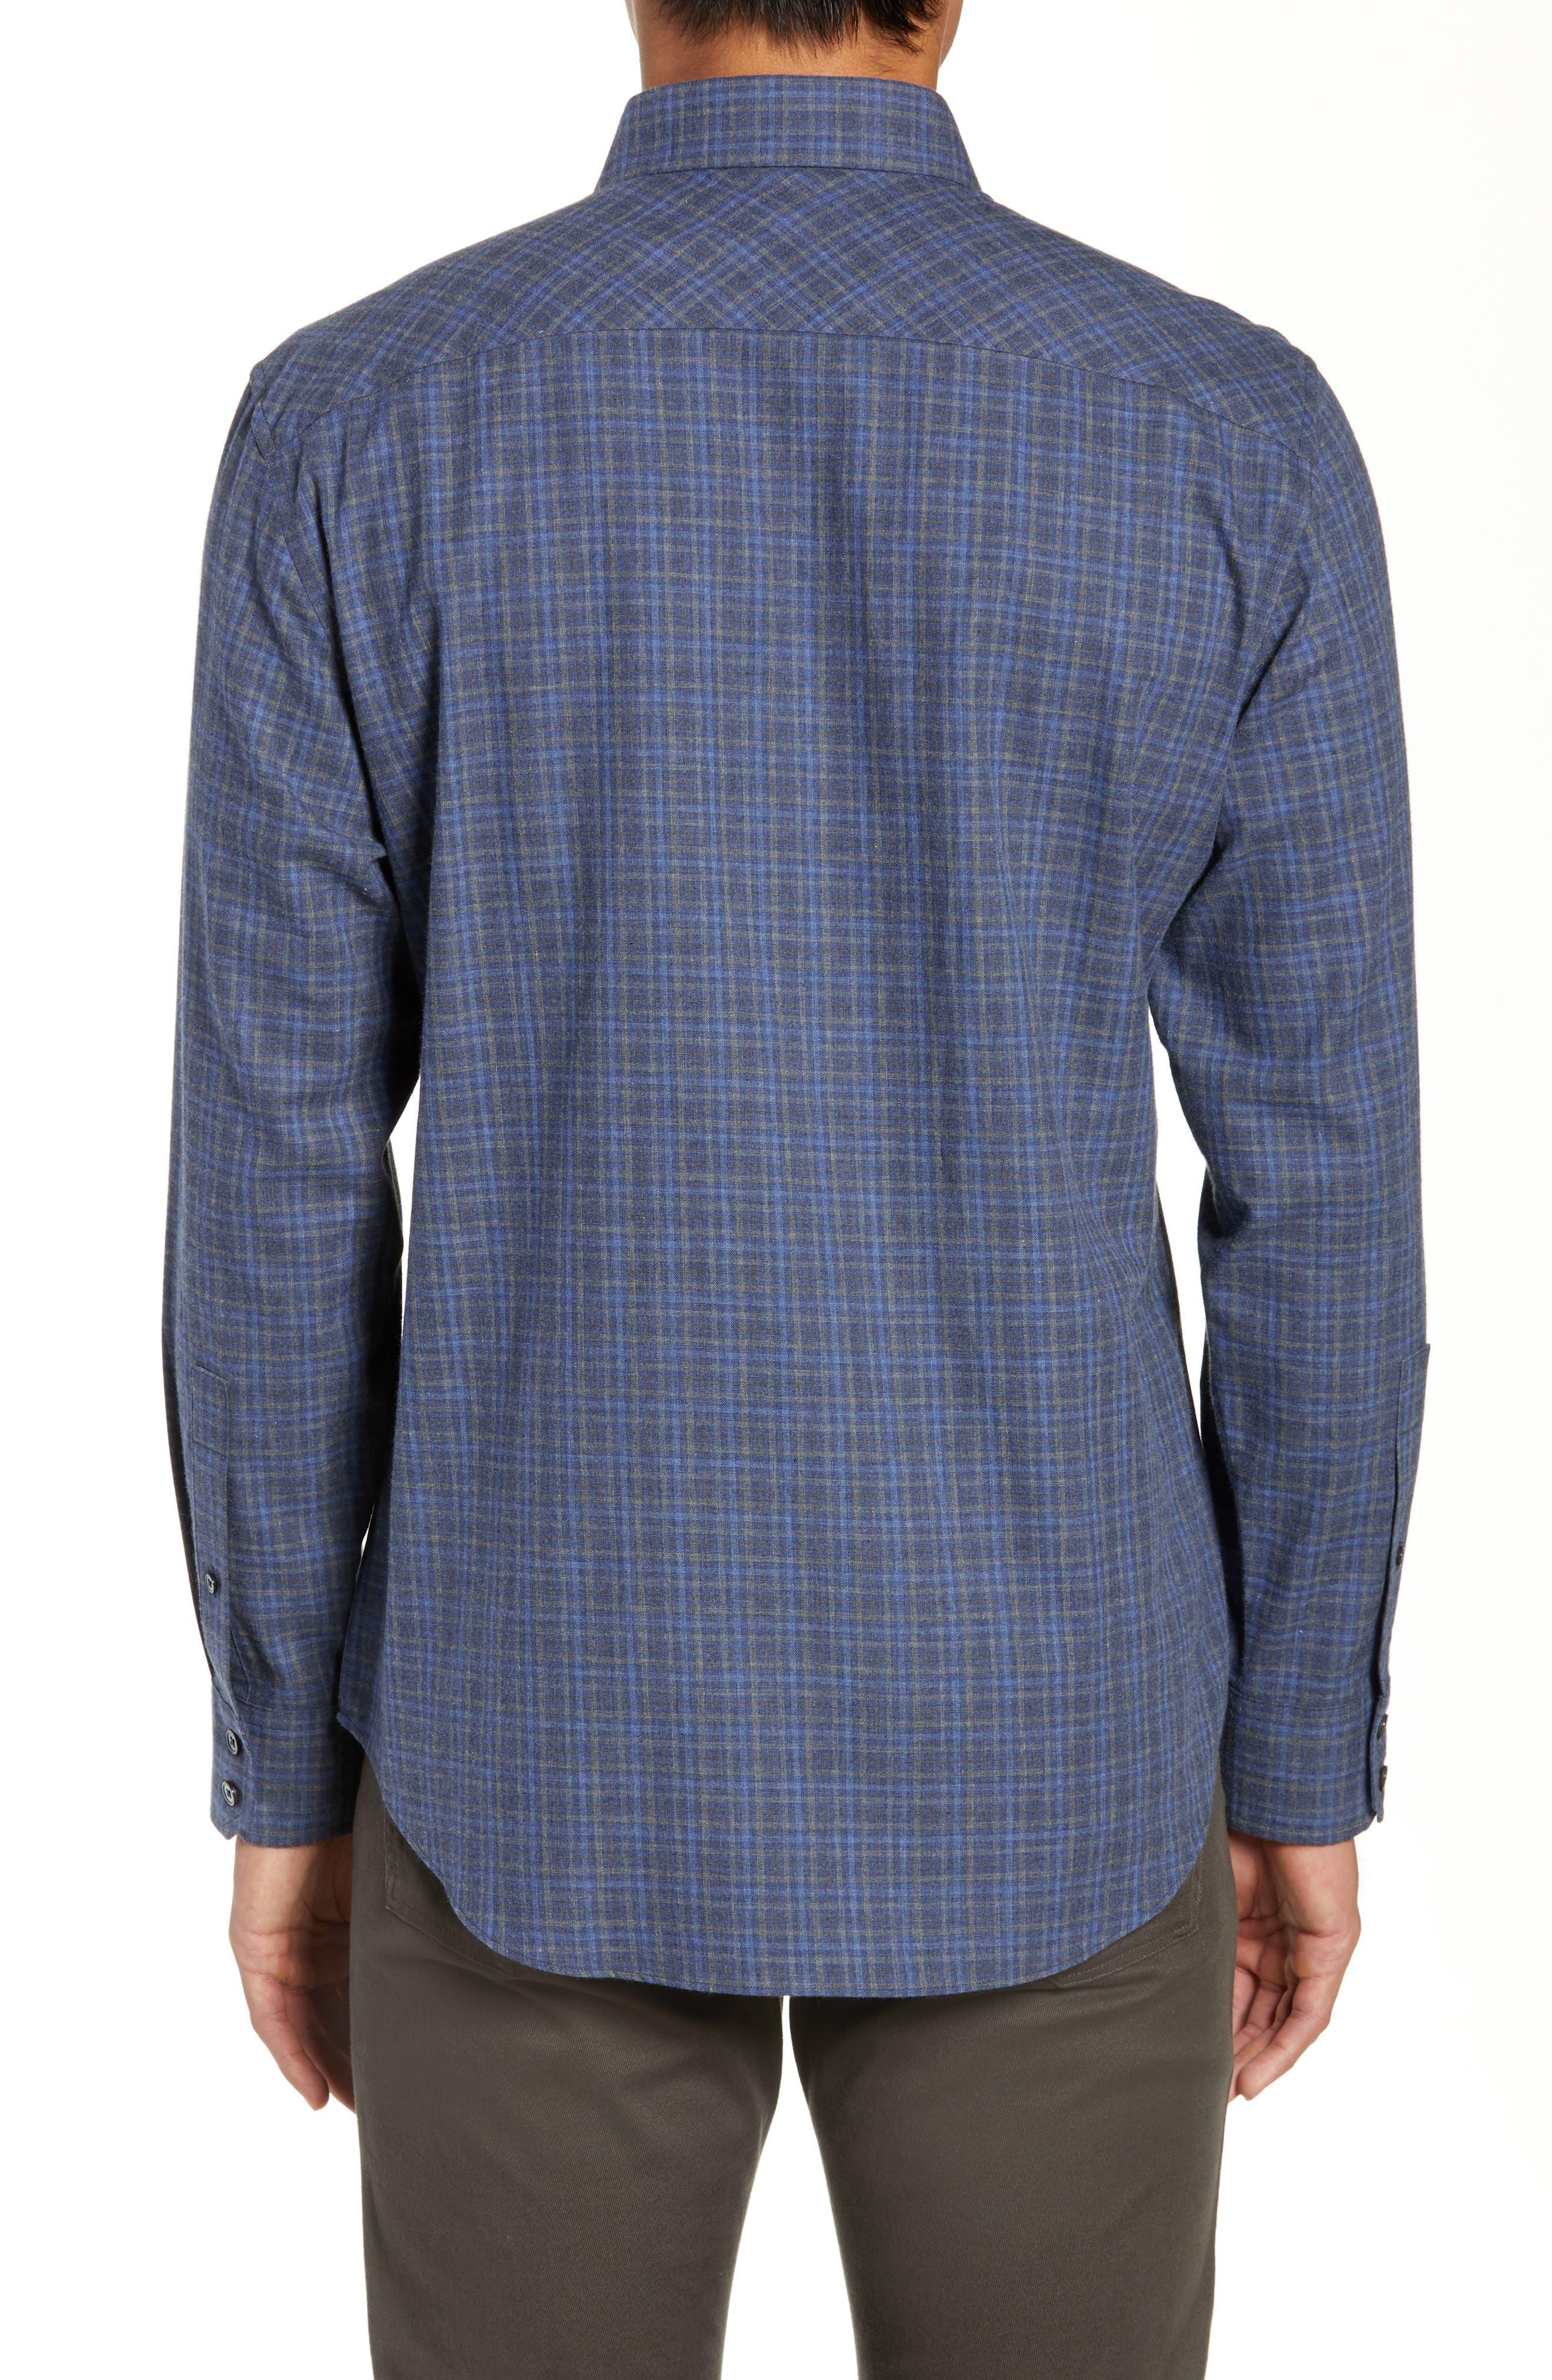 Nguyen Regular Fit Sport Shirt,                             Alternate thumbnail 3, color,                             DARK BLUE